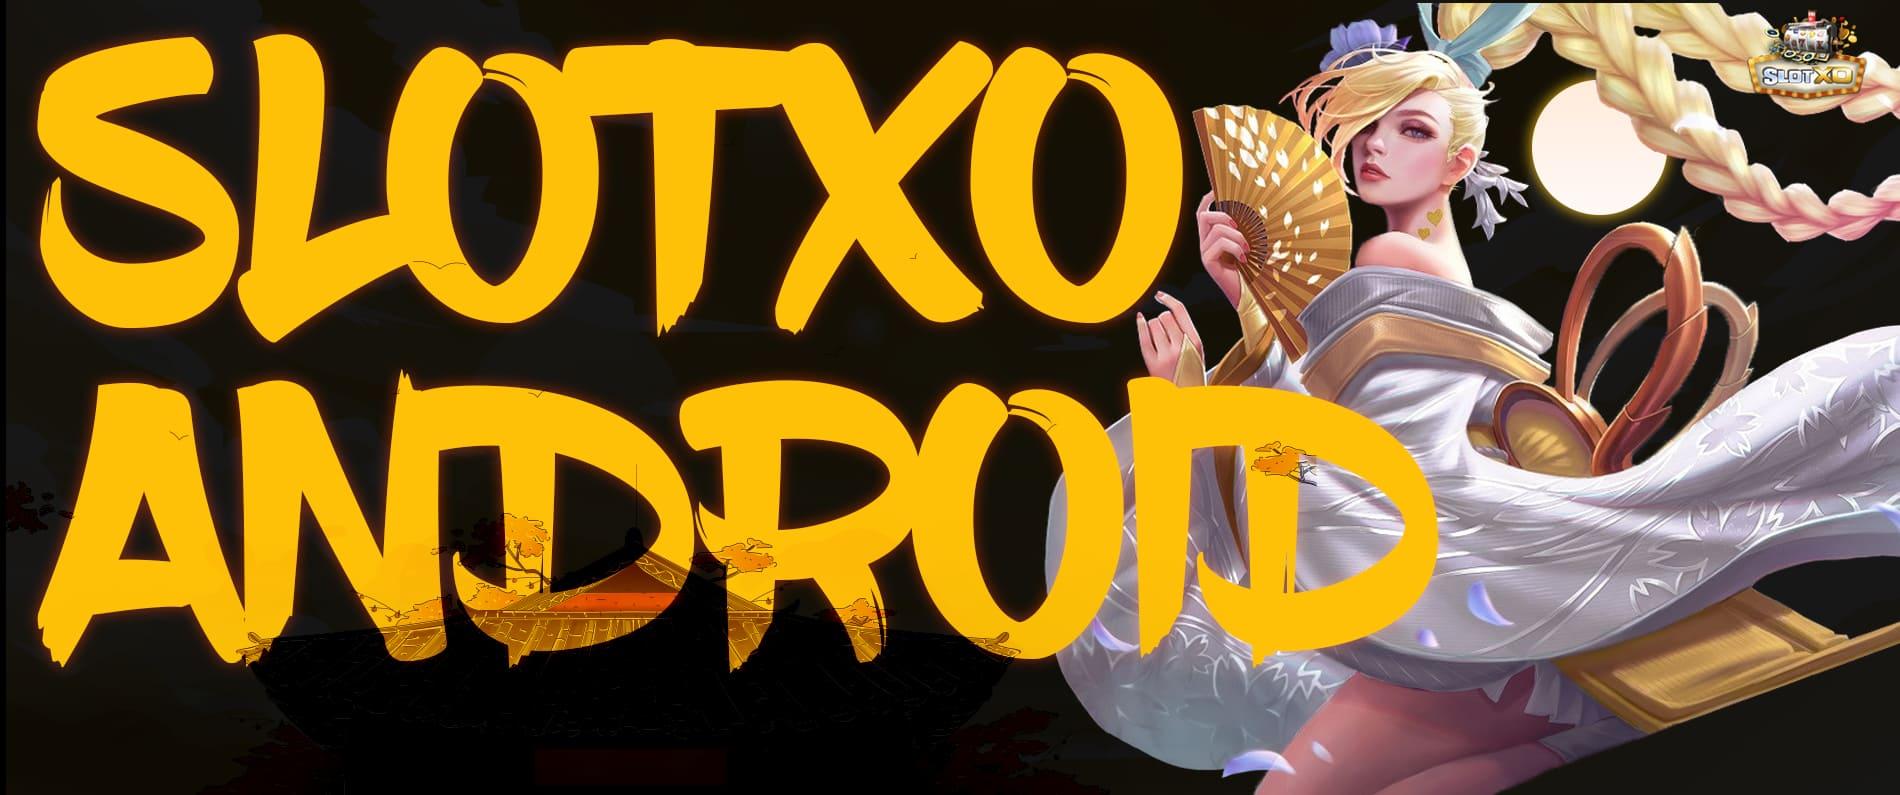 slotxo android download slotxo ดาวน์โหลดslotxo